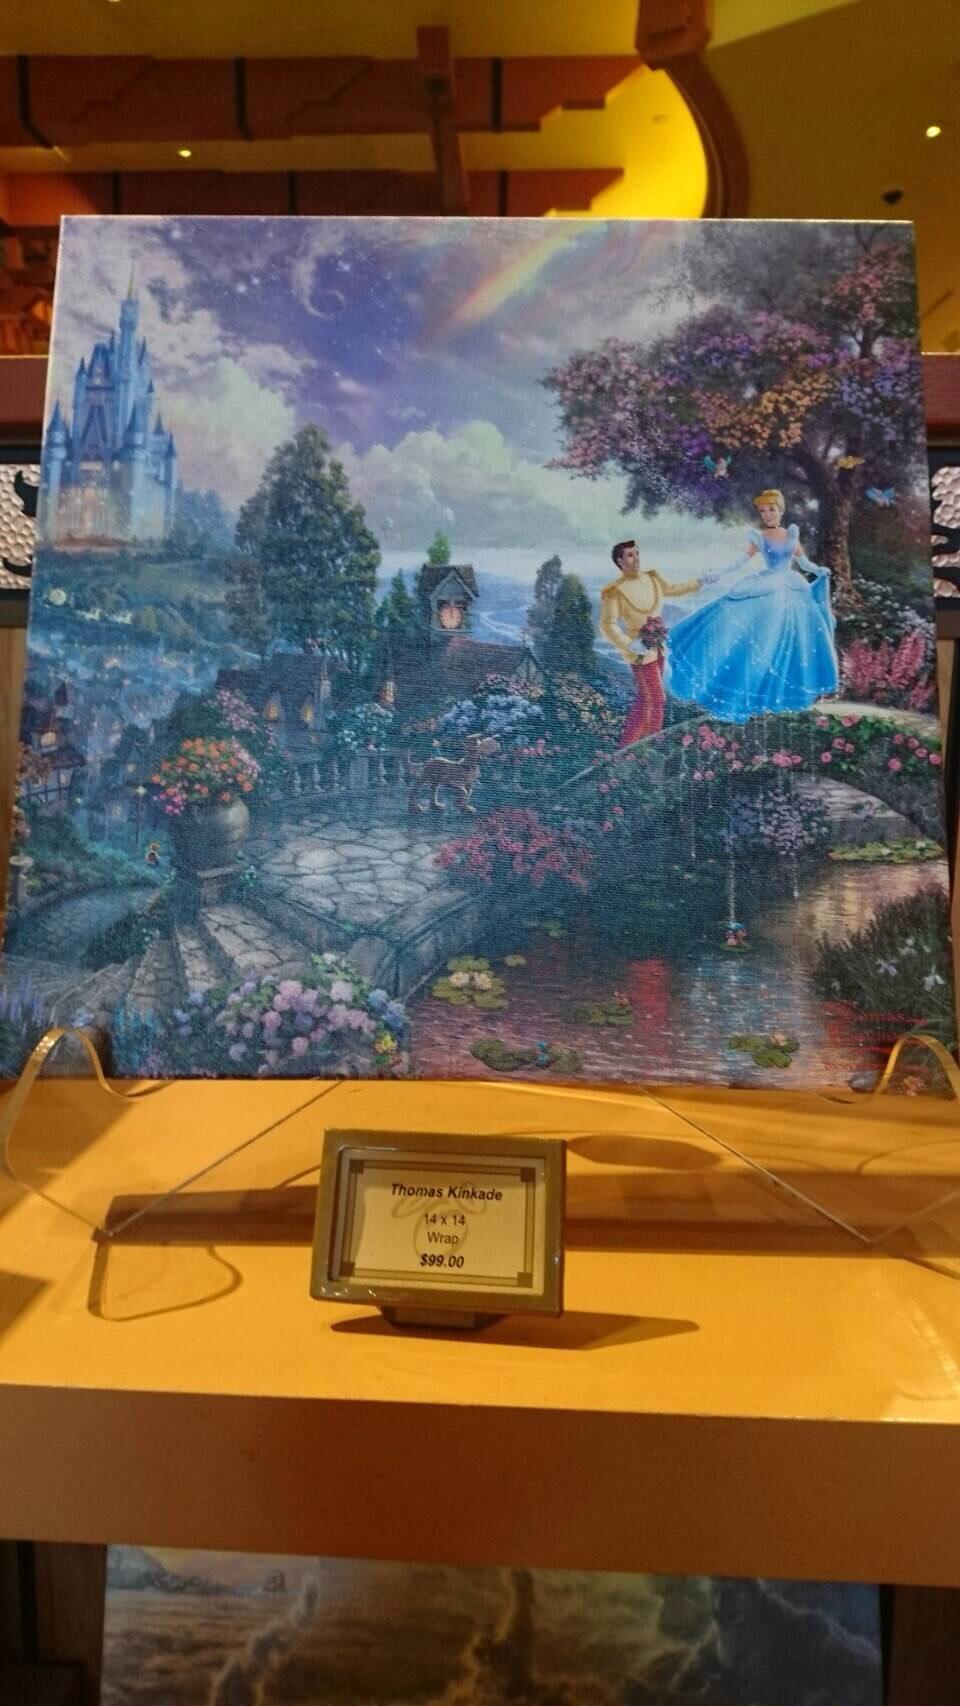 Disneyland ワールドオブディズニー ディズニーギャラリー キンケード 201609